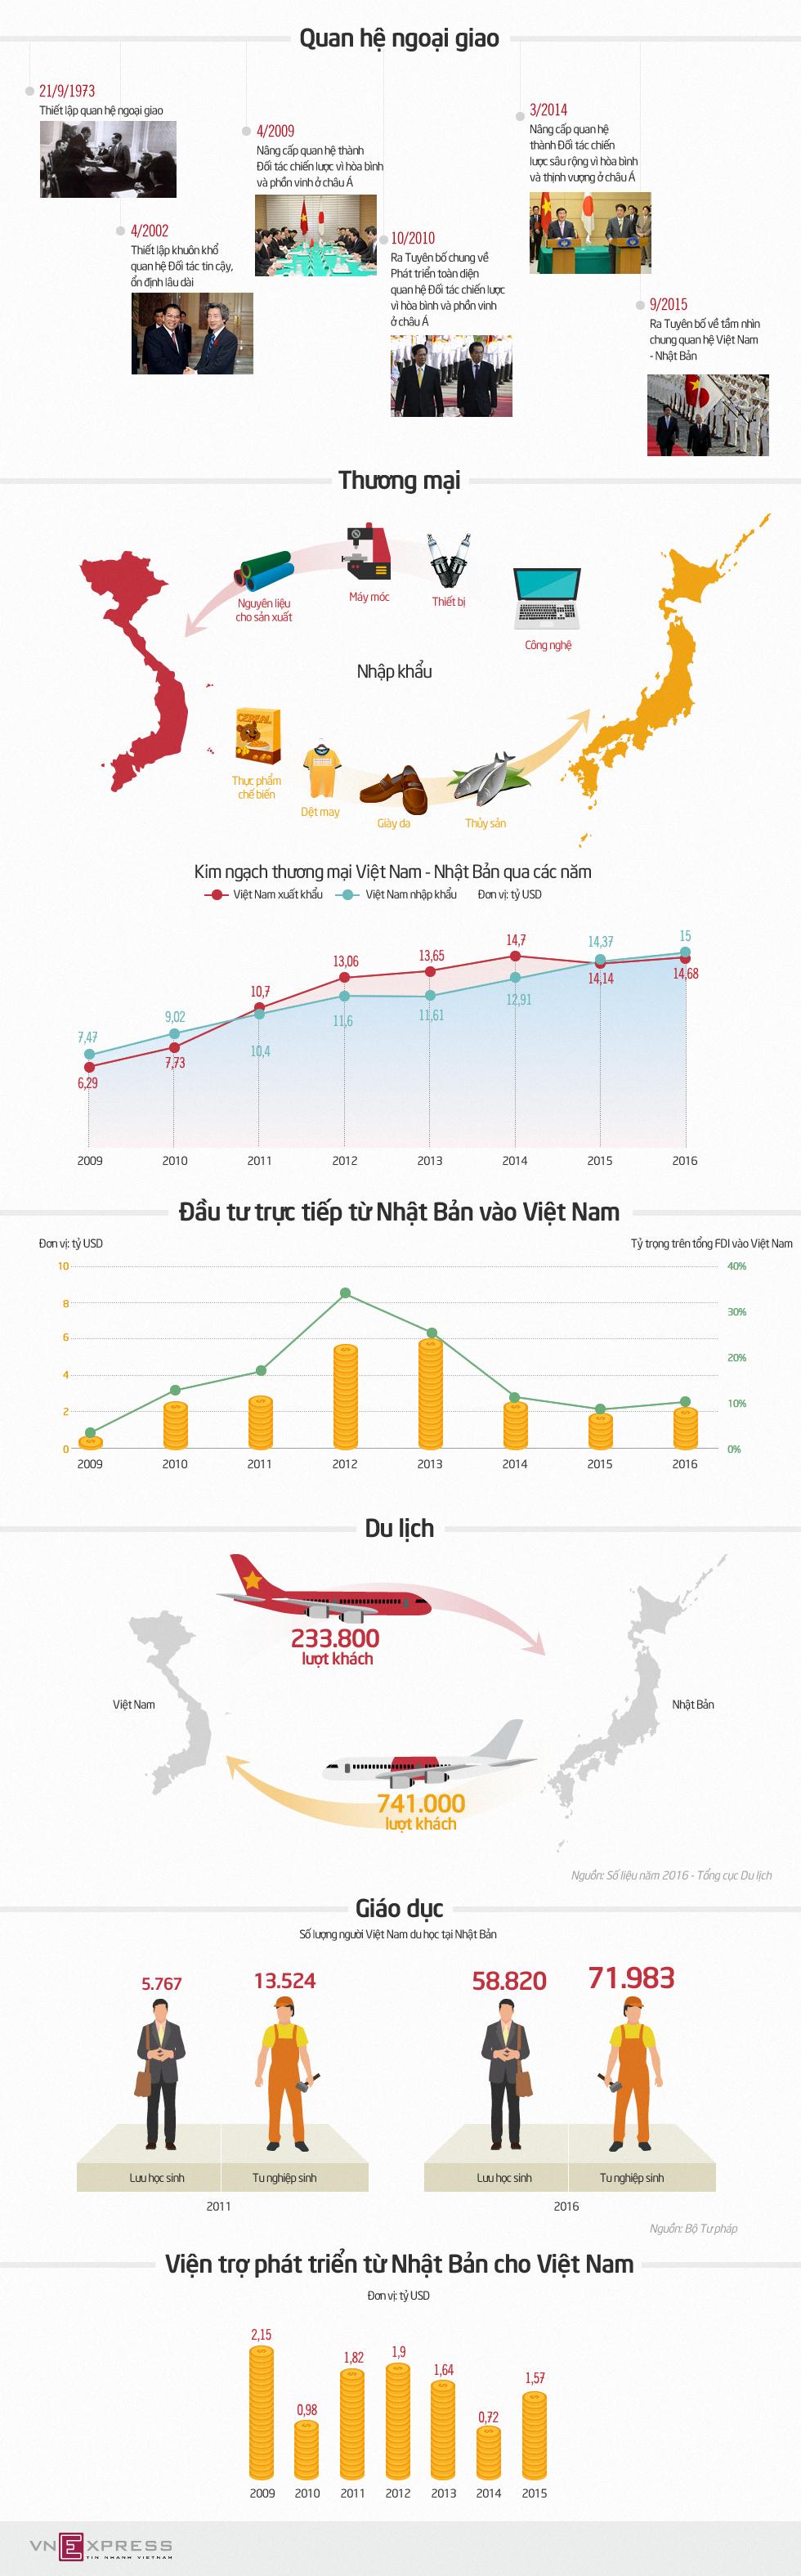 Quan hệ Việt - Nhật qua những con số 1